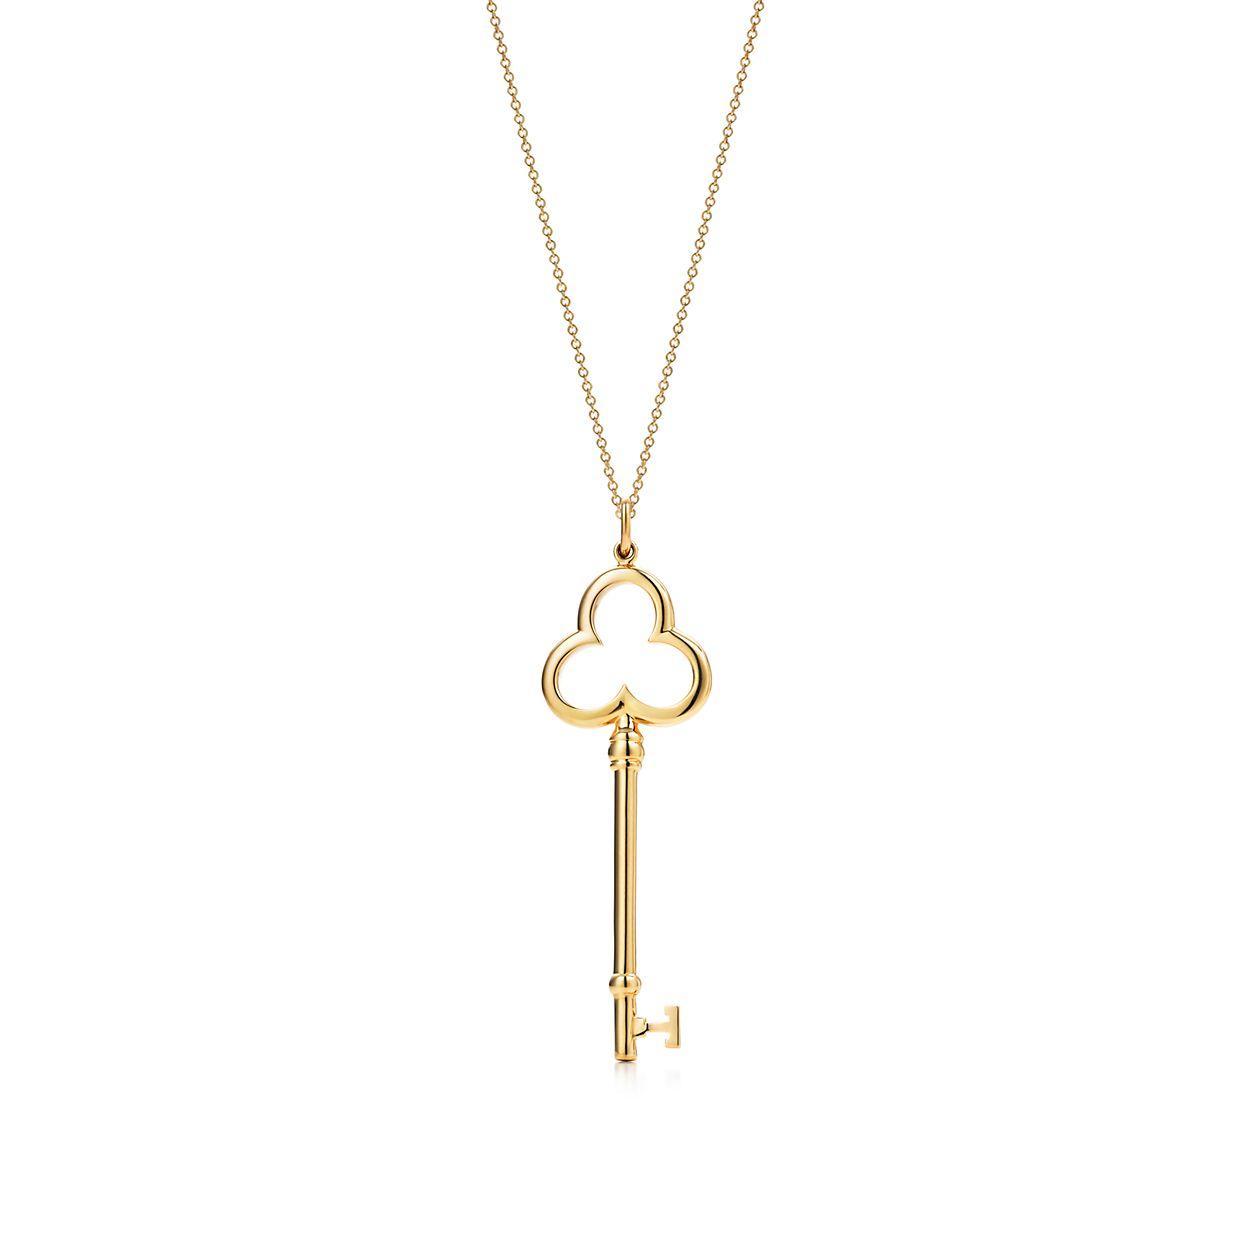 Tiffany Keys trefoil key pendant in 18k gold on a chain. | Tiffany ...